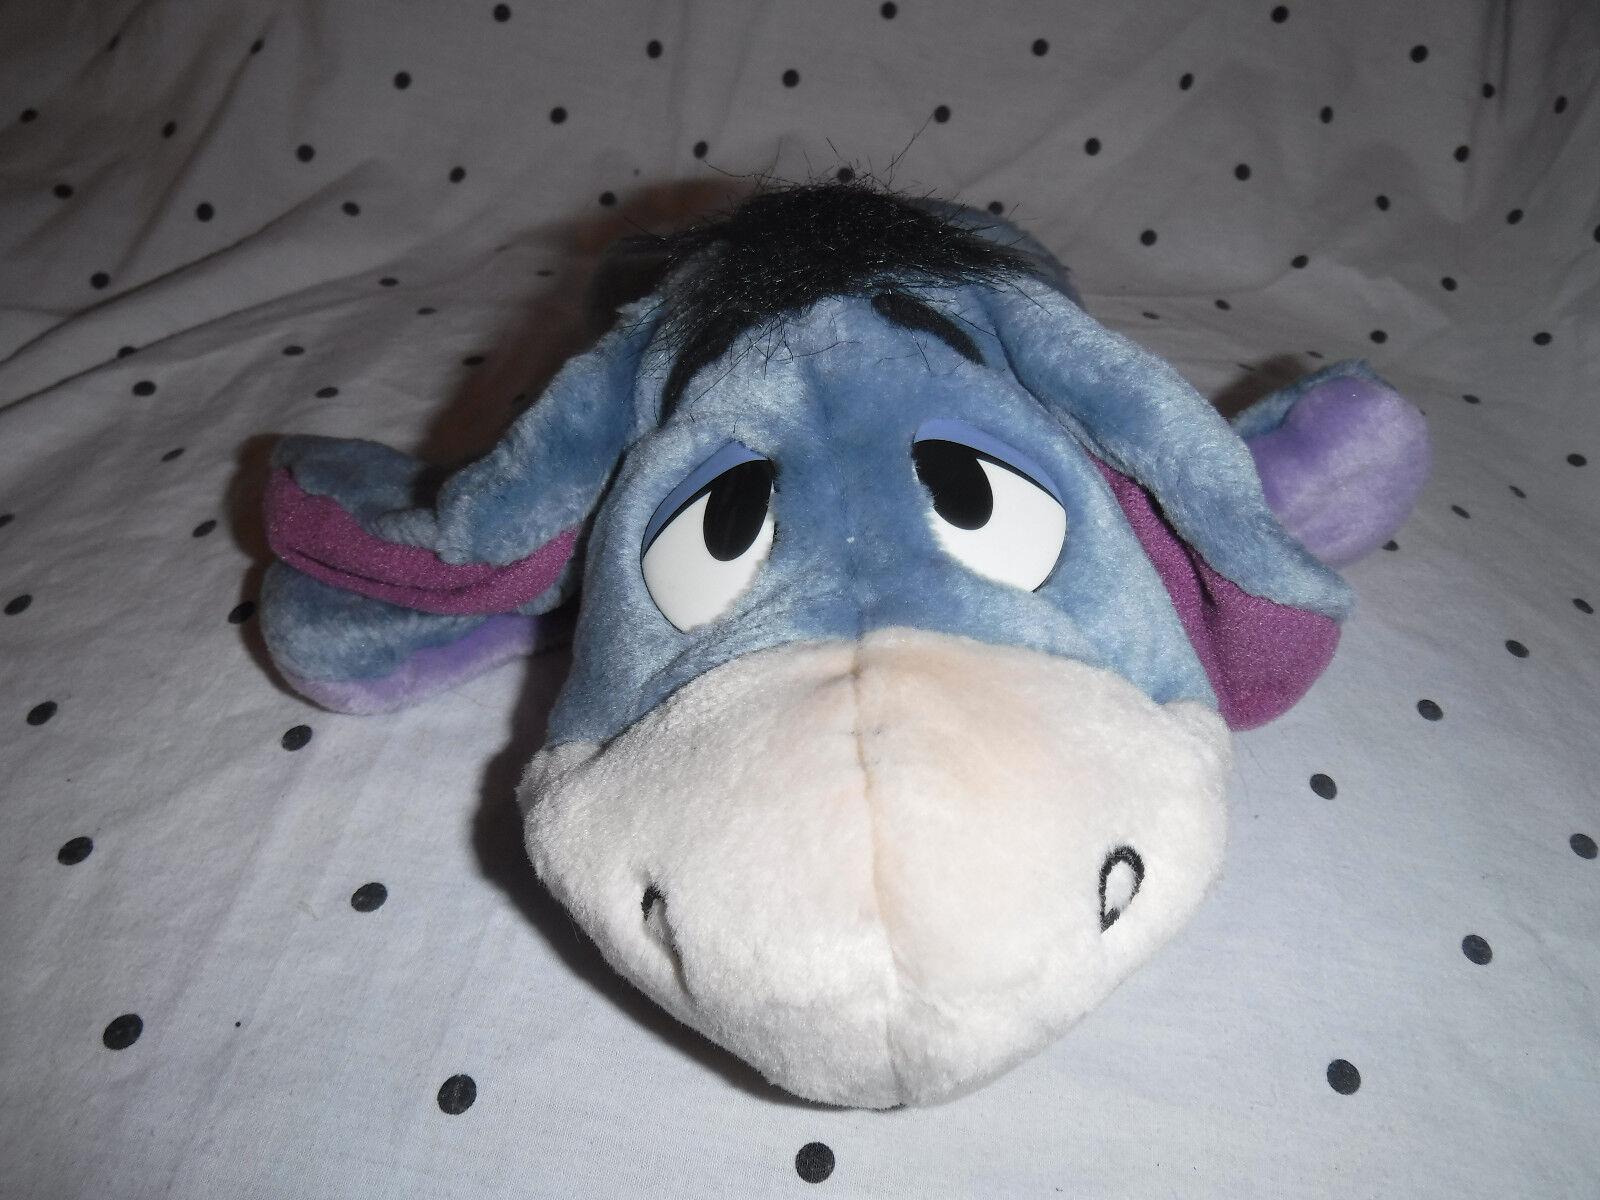 Arcotoys Eeyore Winnie the Pooh Puppet 9  Plush Soft Toy Stuffed Animal